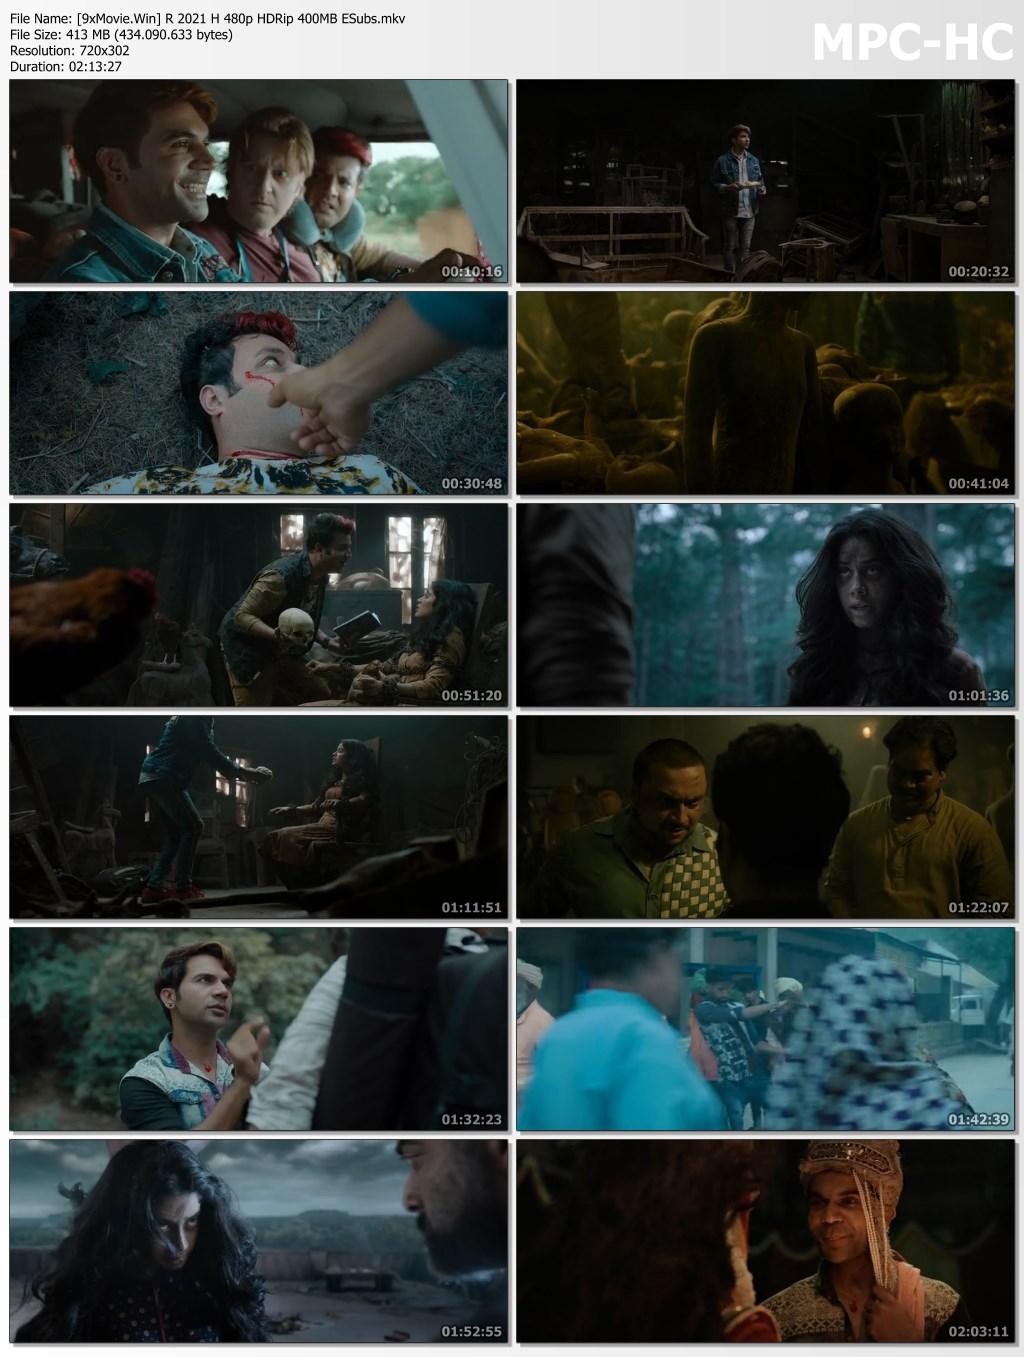 Roohi 2021 Bollywood Movie 480p HDRip x264 400MB ESubs